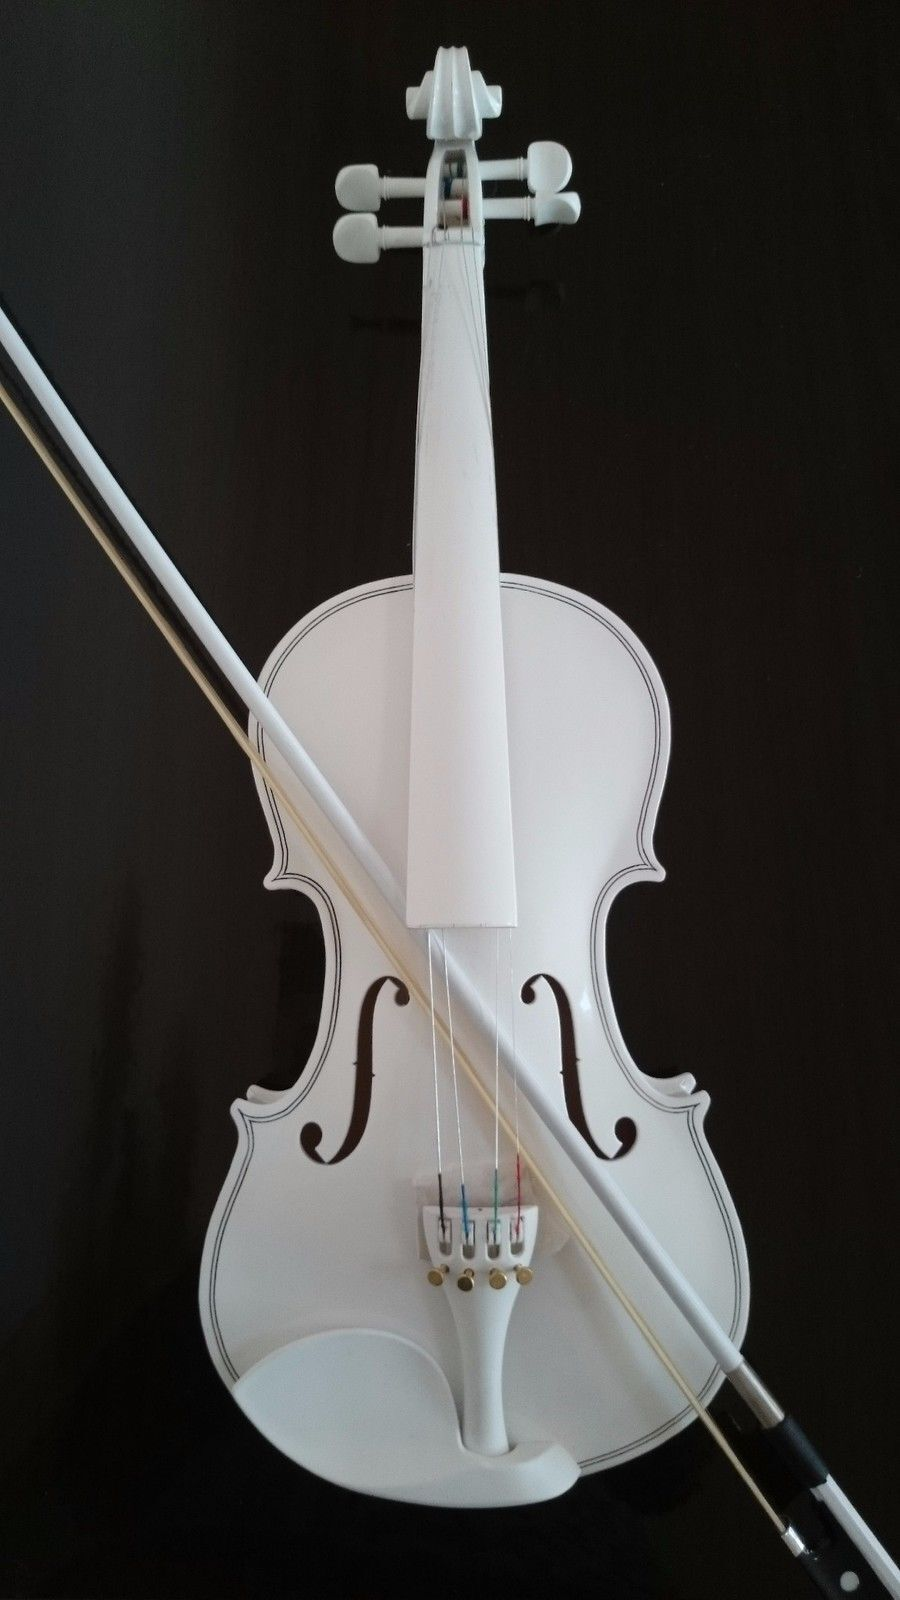 Estudiante Acústica Acústica Acústica Violín Completo 4 4 Maple Abeto Con Funda Arco Resina todos blancooColor  hasta 60% de descuento